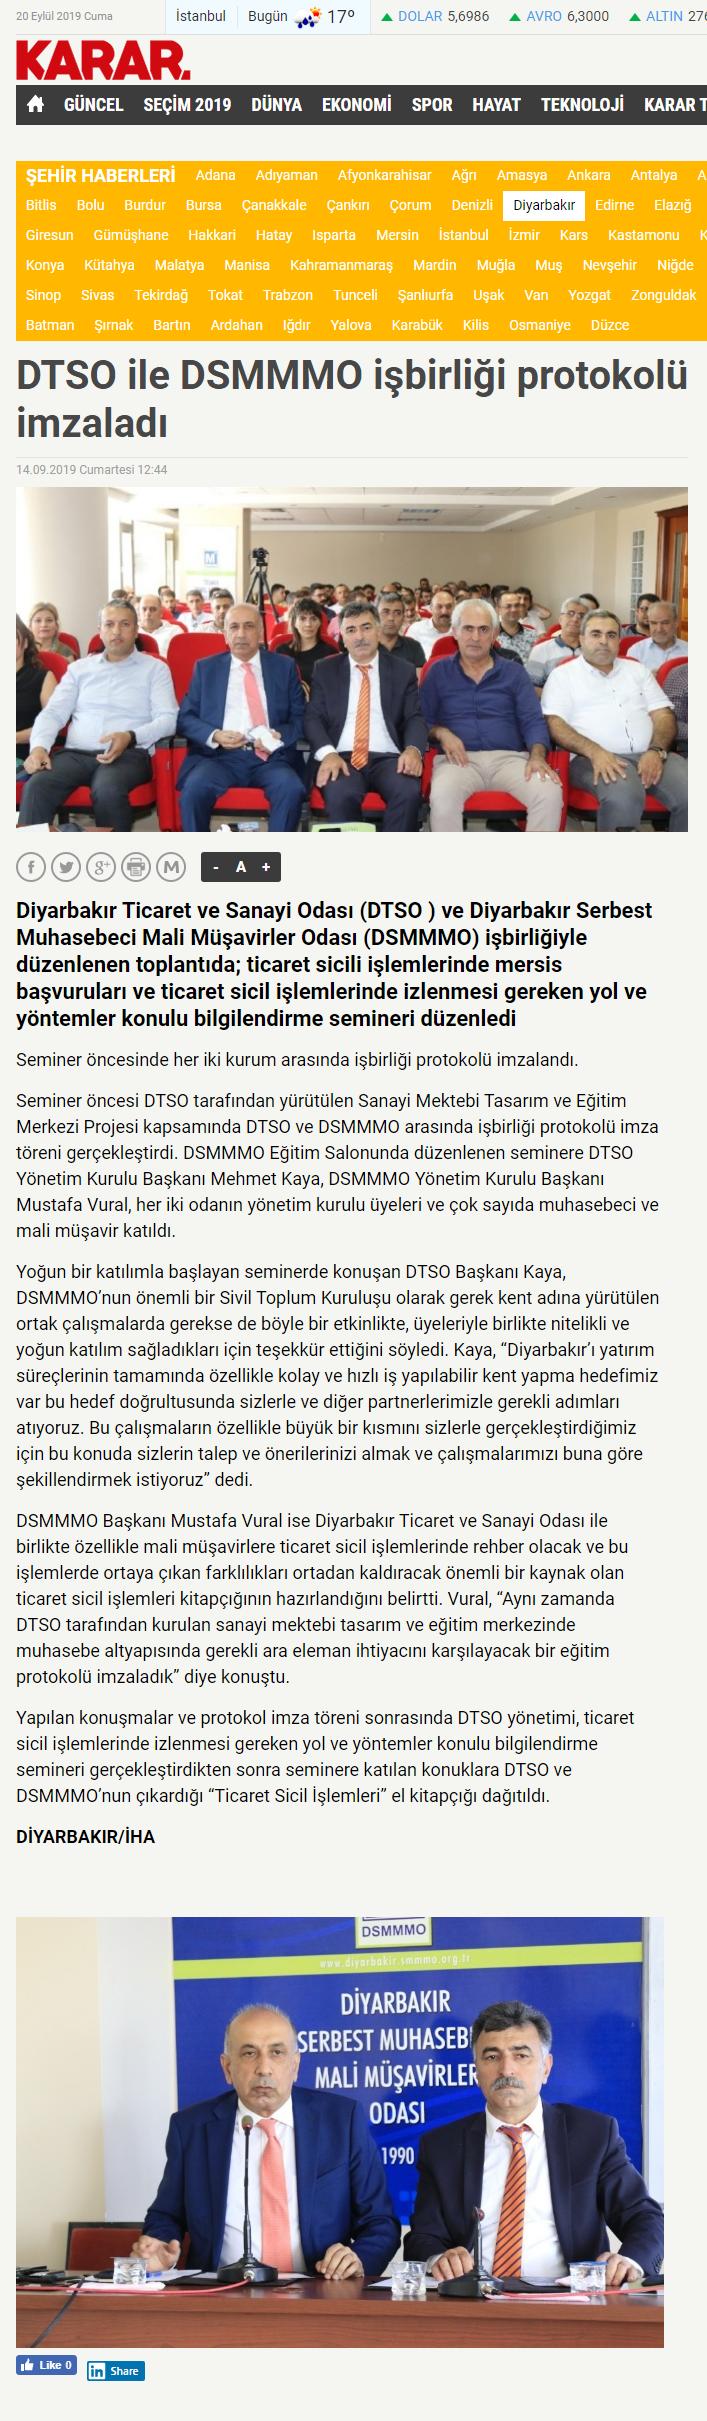 DTSO İLE DSMMMO İŞBİRLİĞİ PROTOKOLÜ İMZALADI (karar.com)